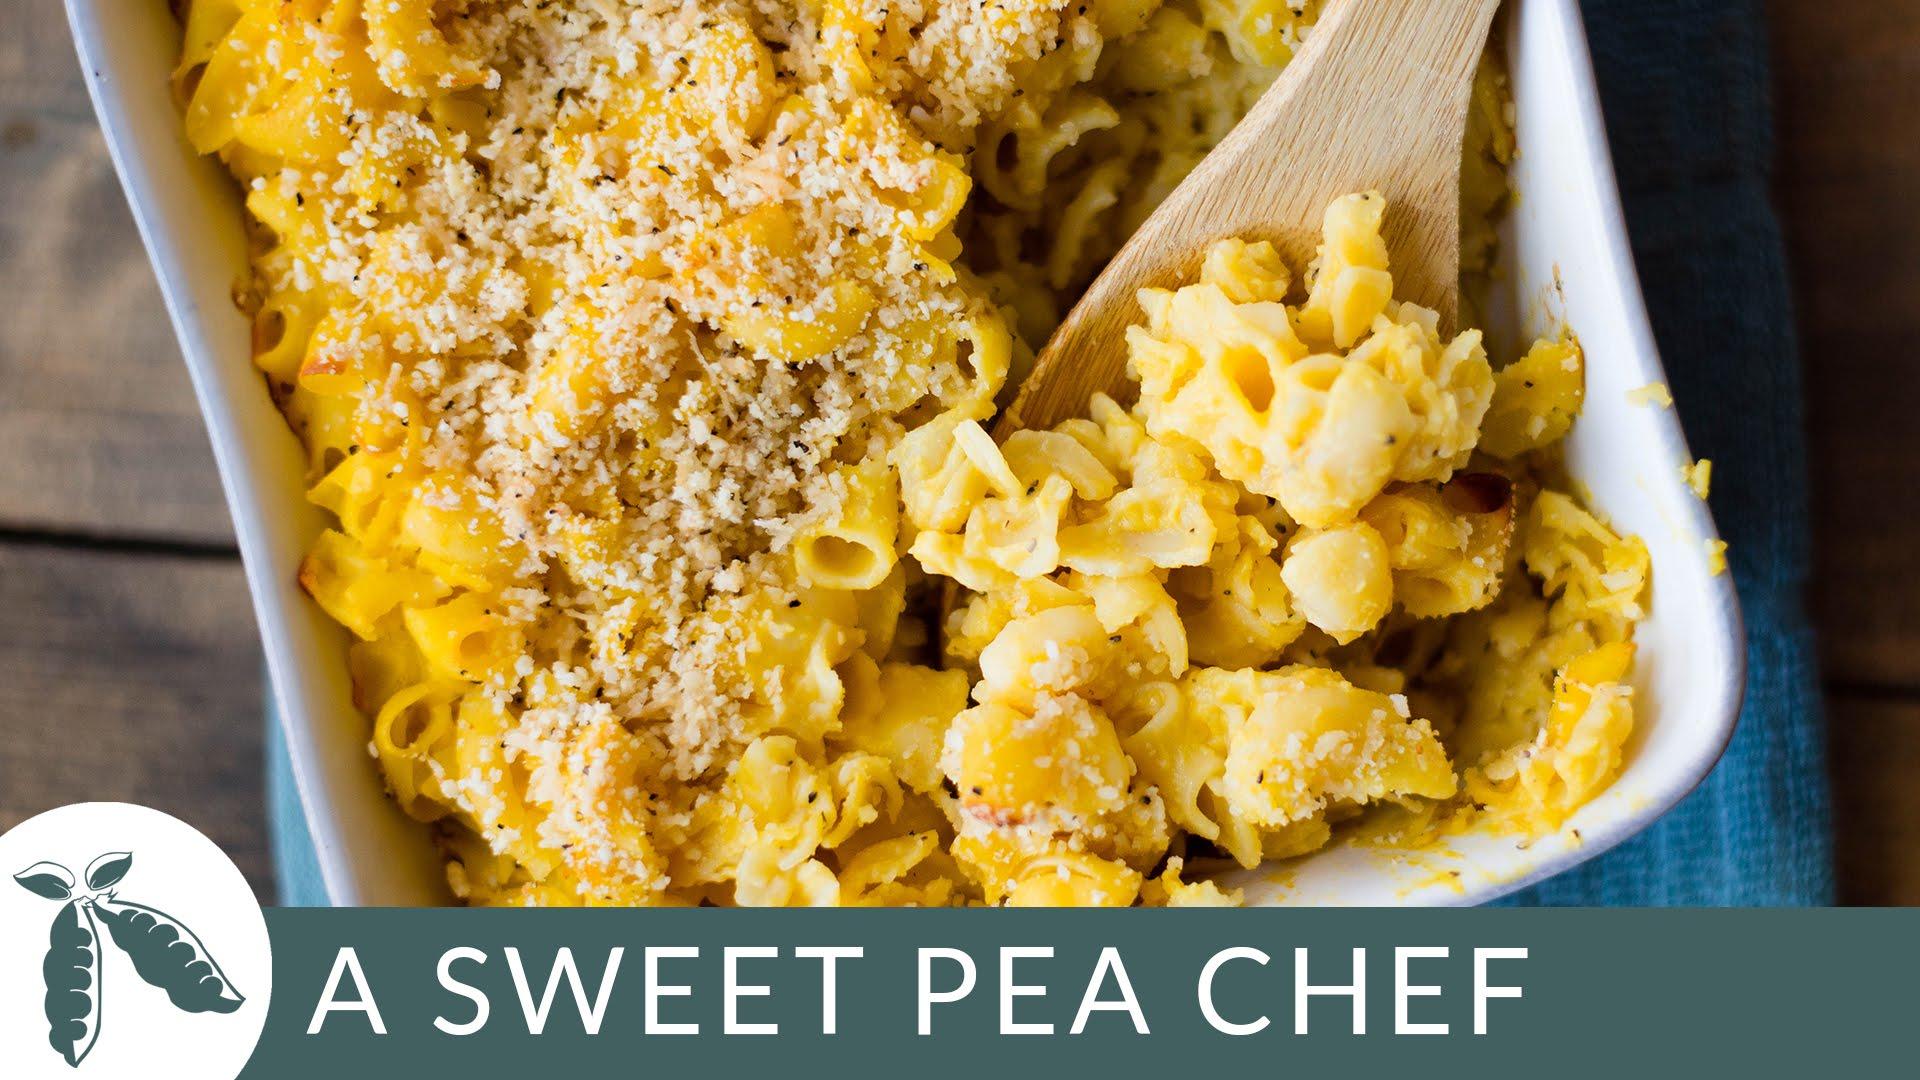 How to make mac n cheese more healthy